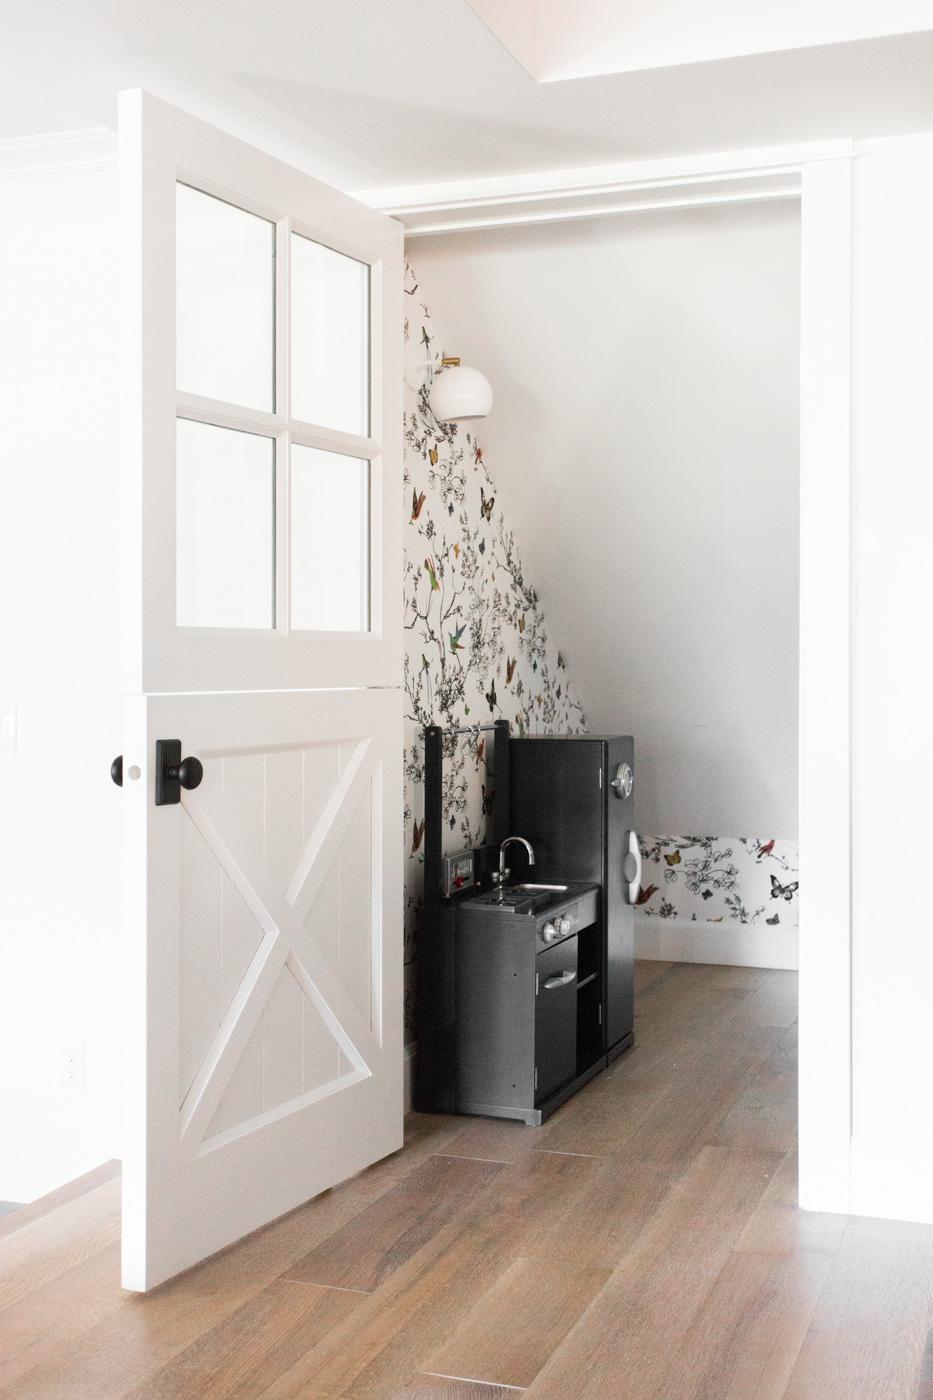 Closet+playroom+with+dutch+door+and+wallpaper+||+Studio+McGee.jpg